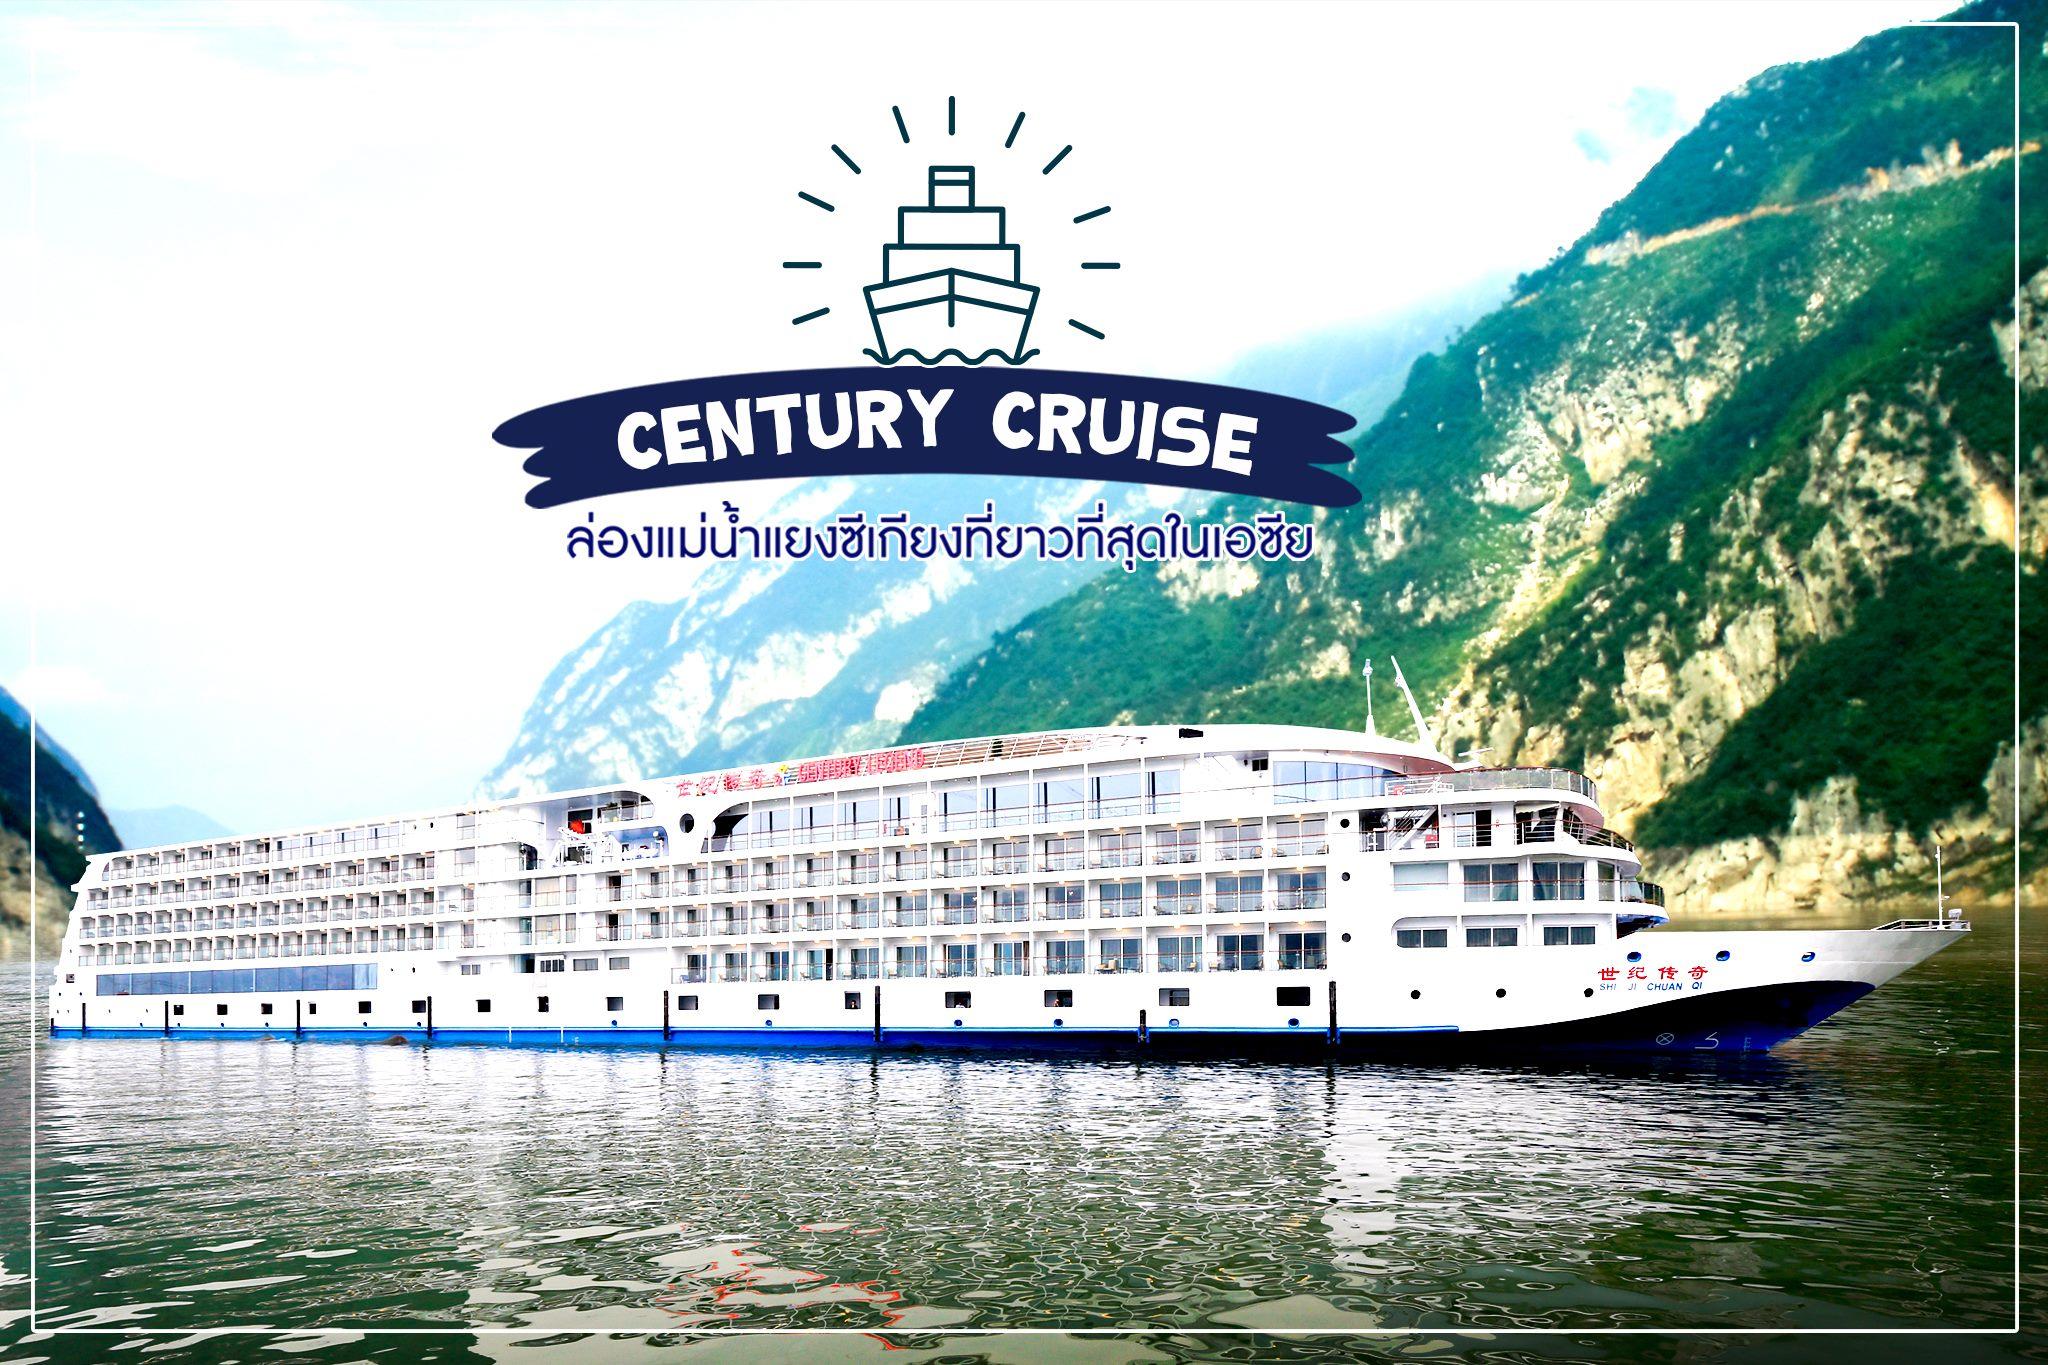 #CenturyCruise เรือCentury Cruise ล่องผืนน้่ำแยงซีเกียง